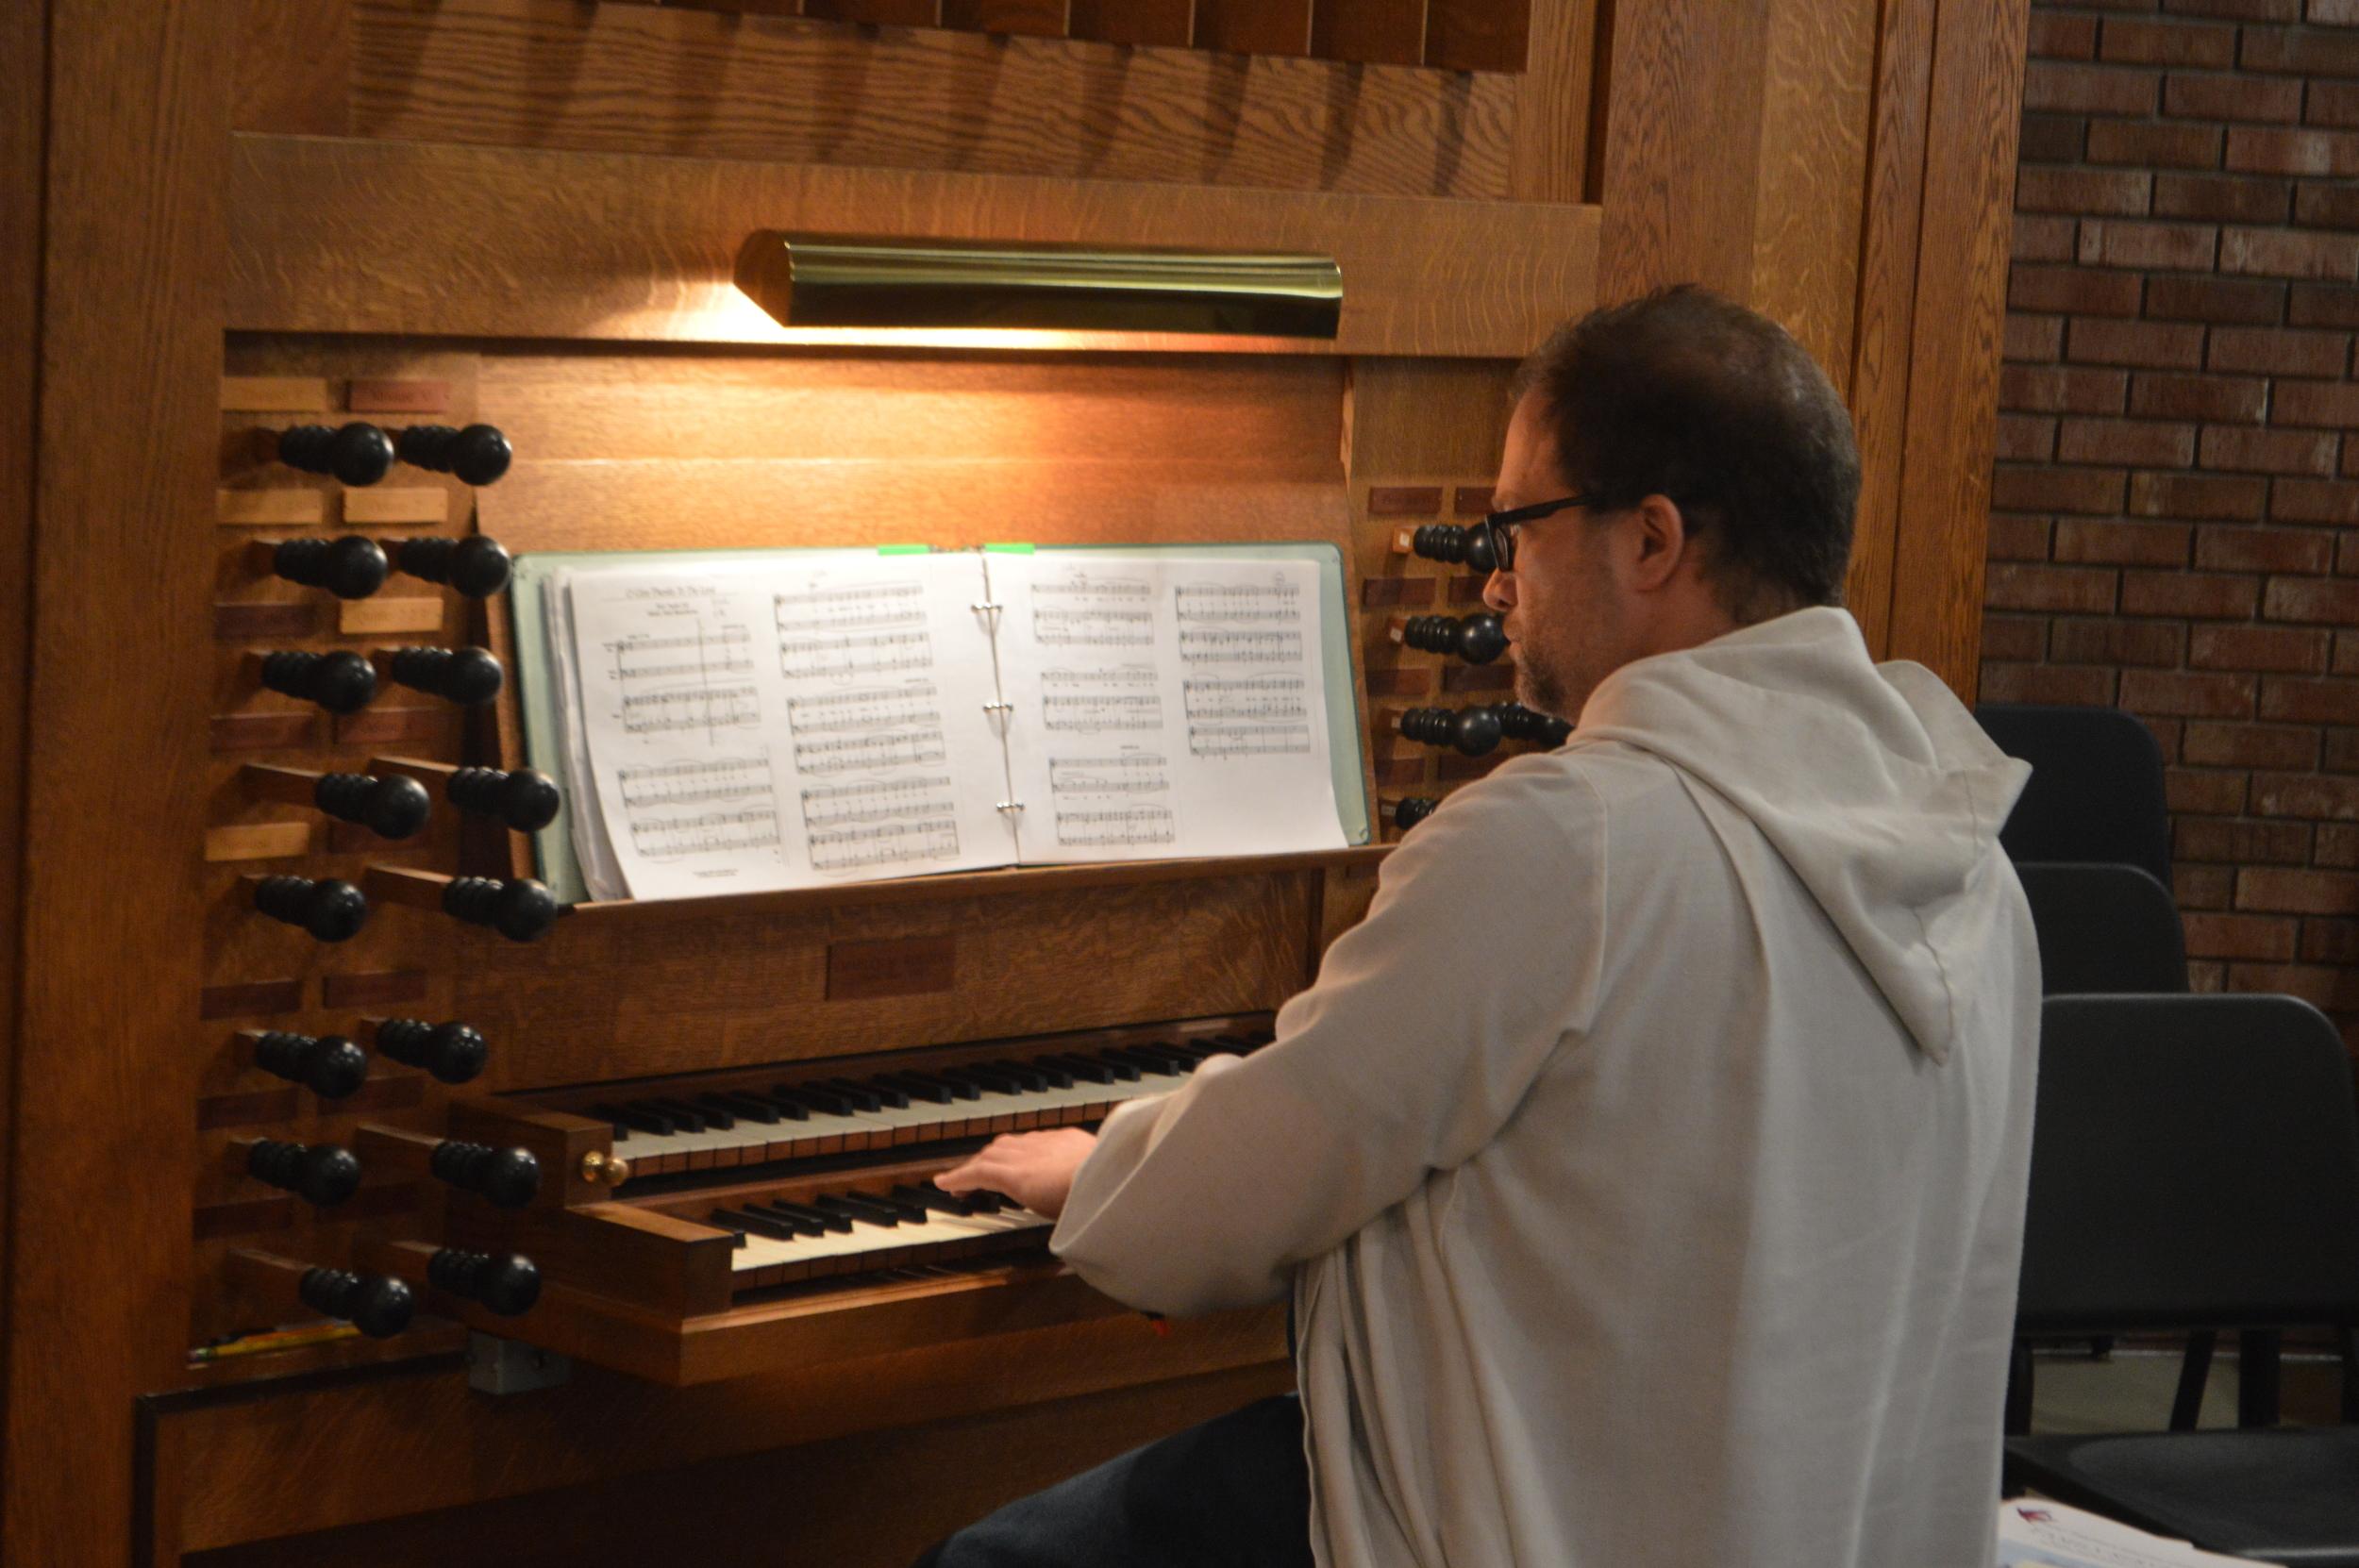 St. Timothy's assistant organist John Crandall